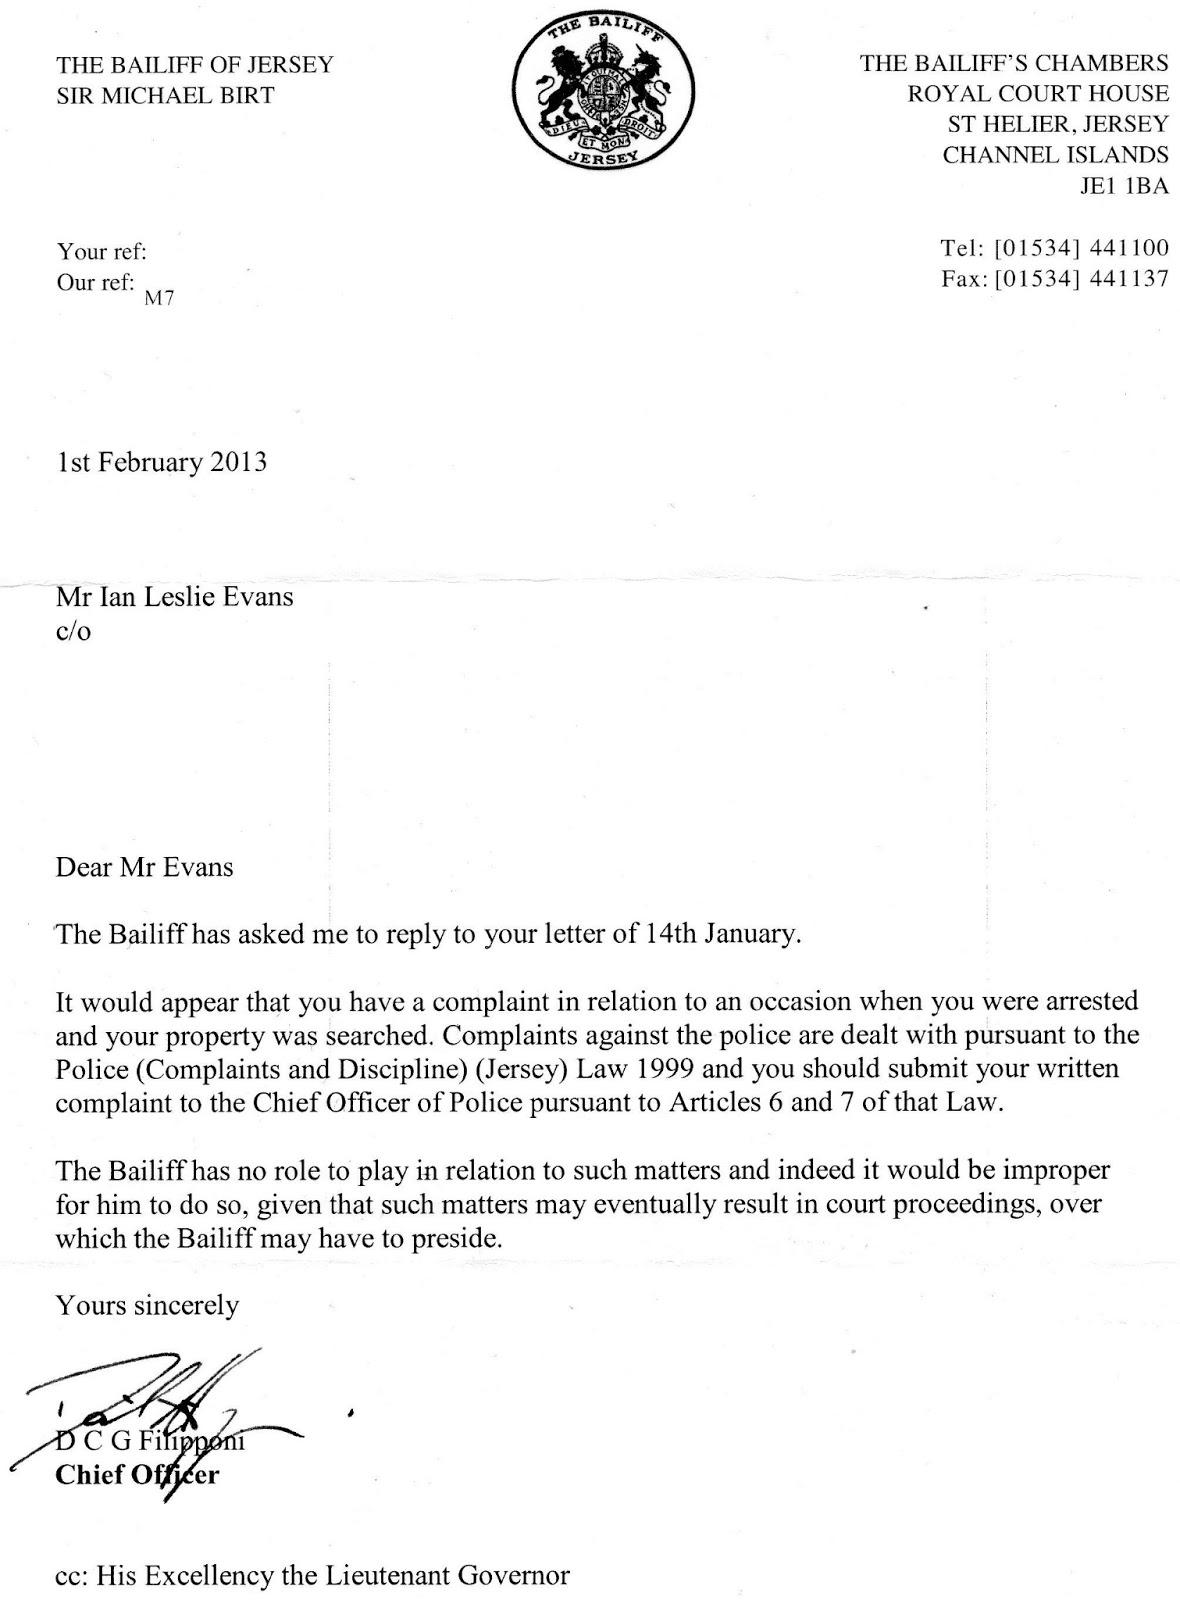 complaint letter examples powerhit radiotk